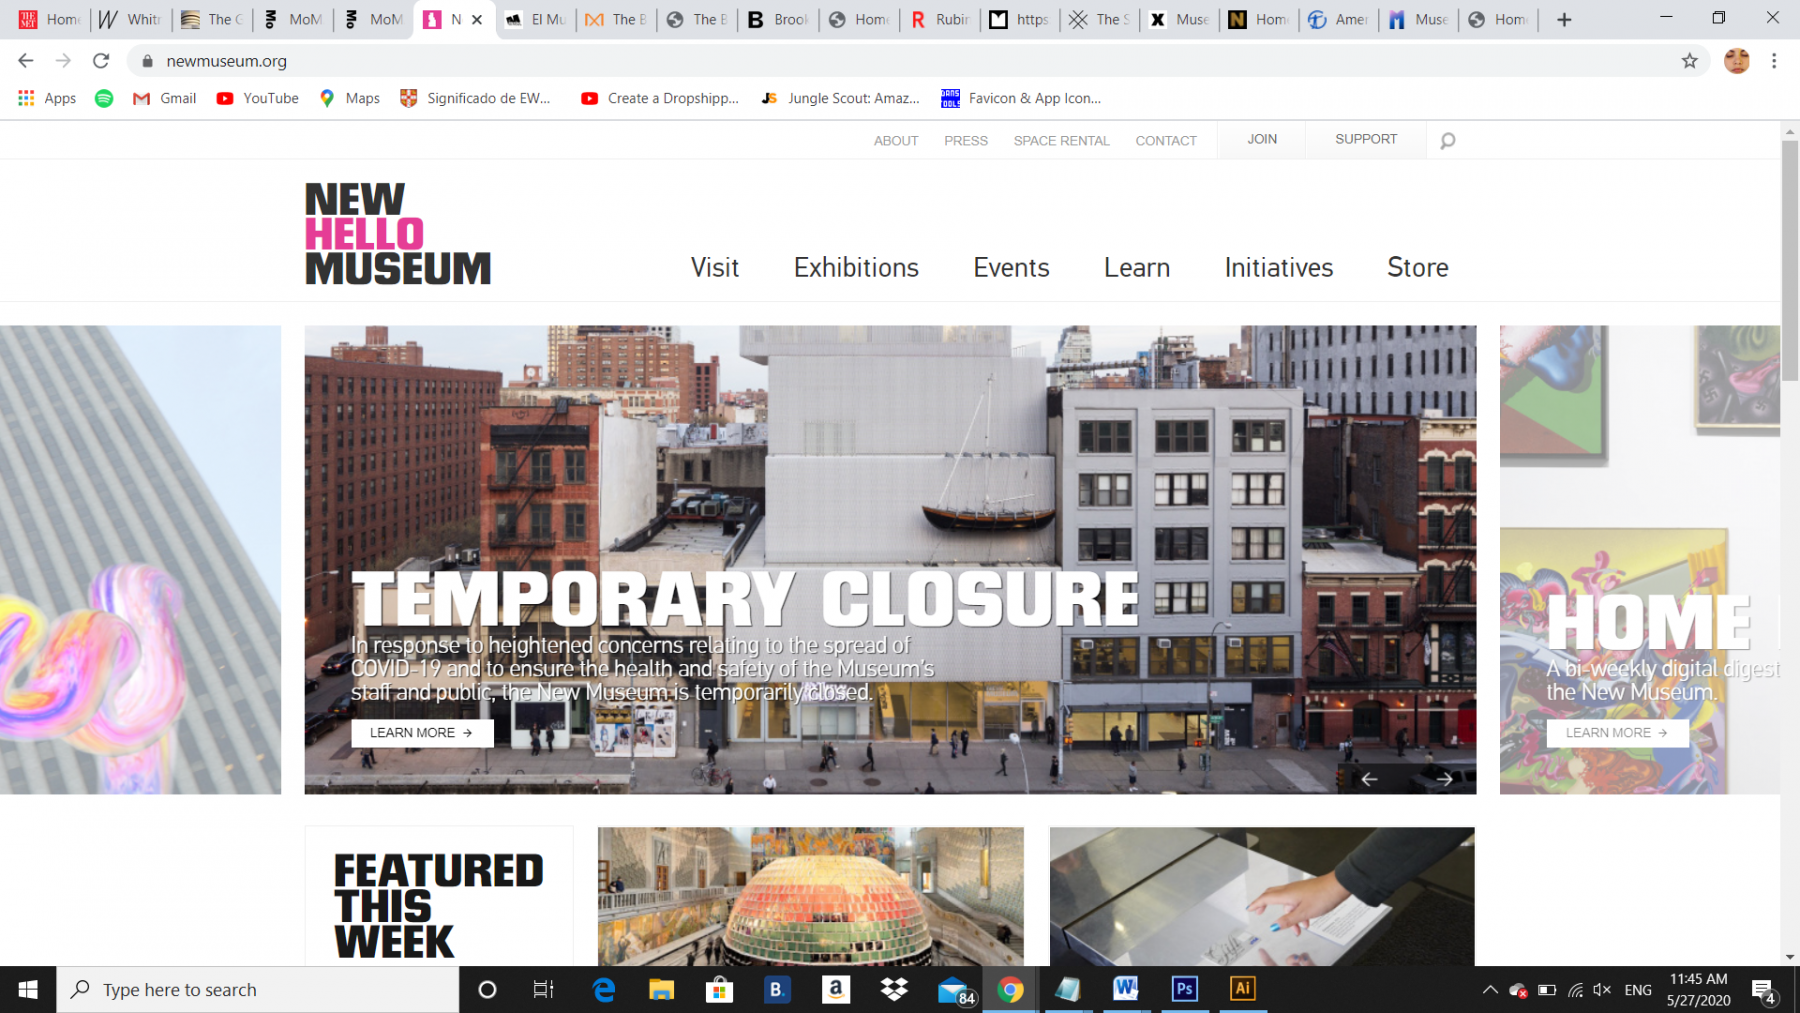 www.newmuseum.org-2020-Photography-Naivy-Perez